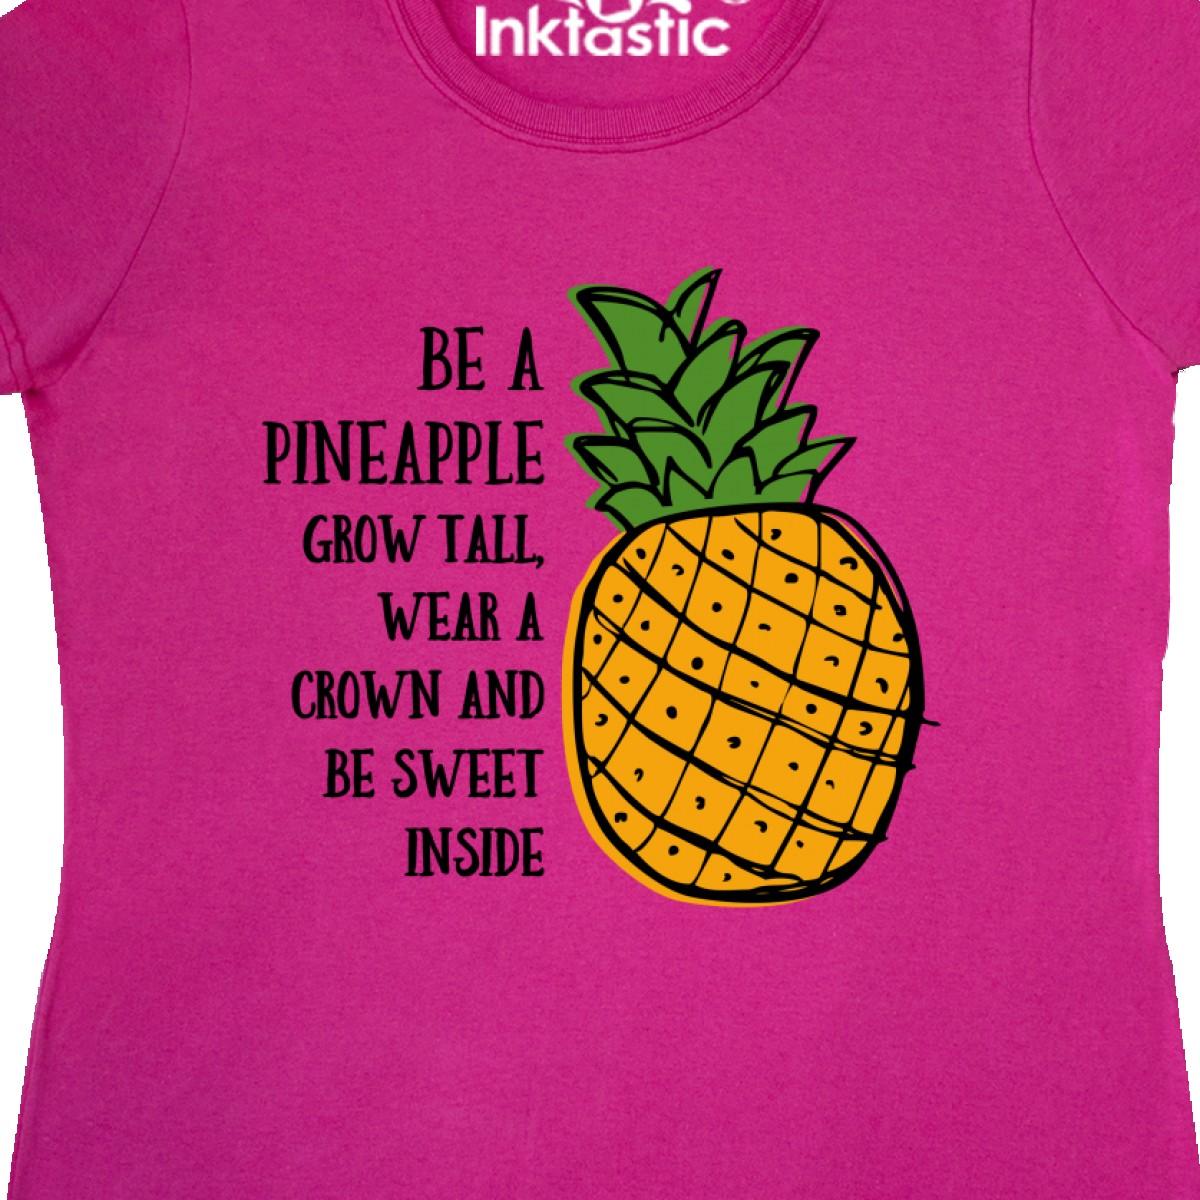 Inktastic Be A Pineapple Women/'s T-Shirt Grow Tall Wear Crown Sweet Inside Fun